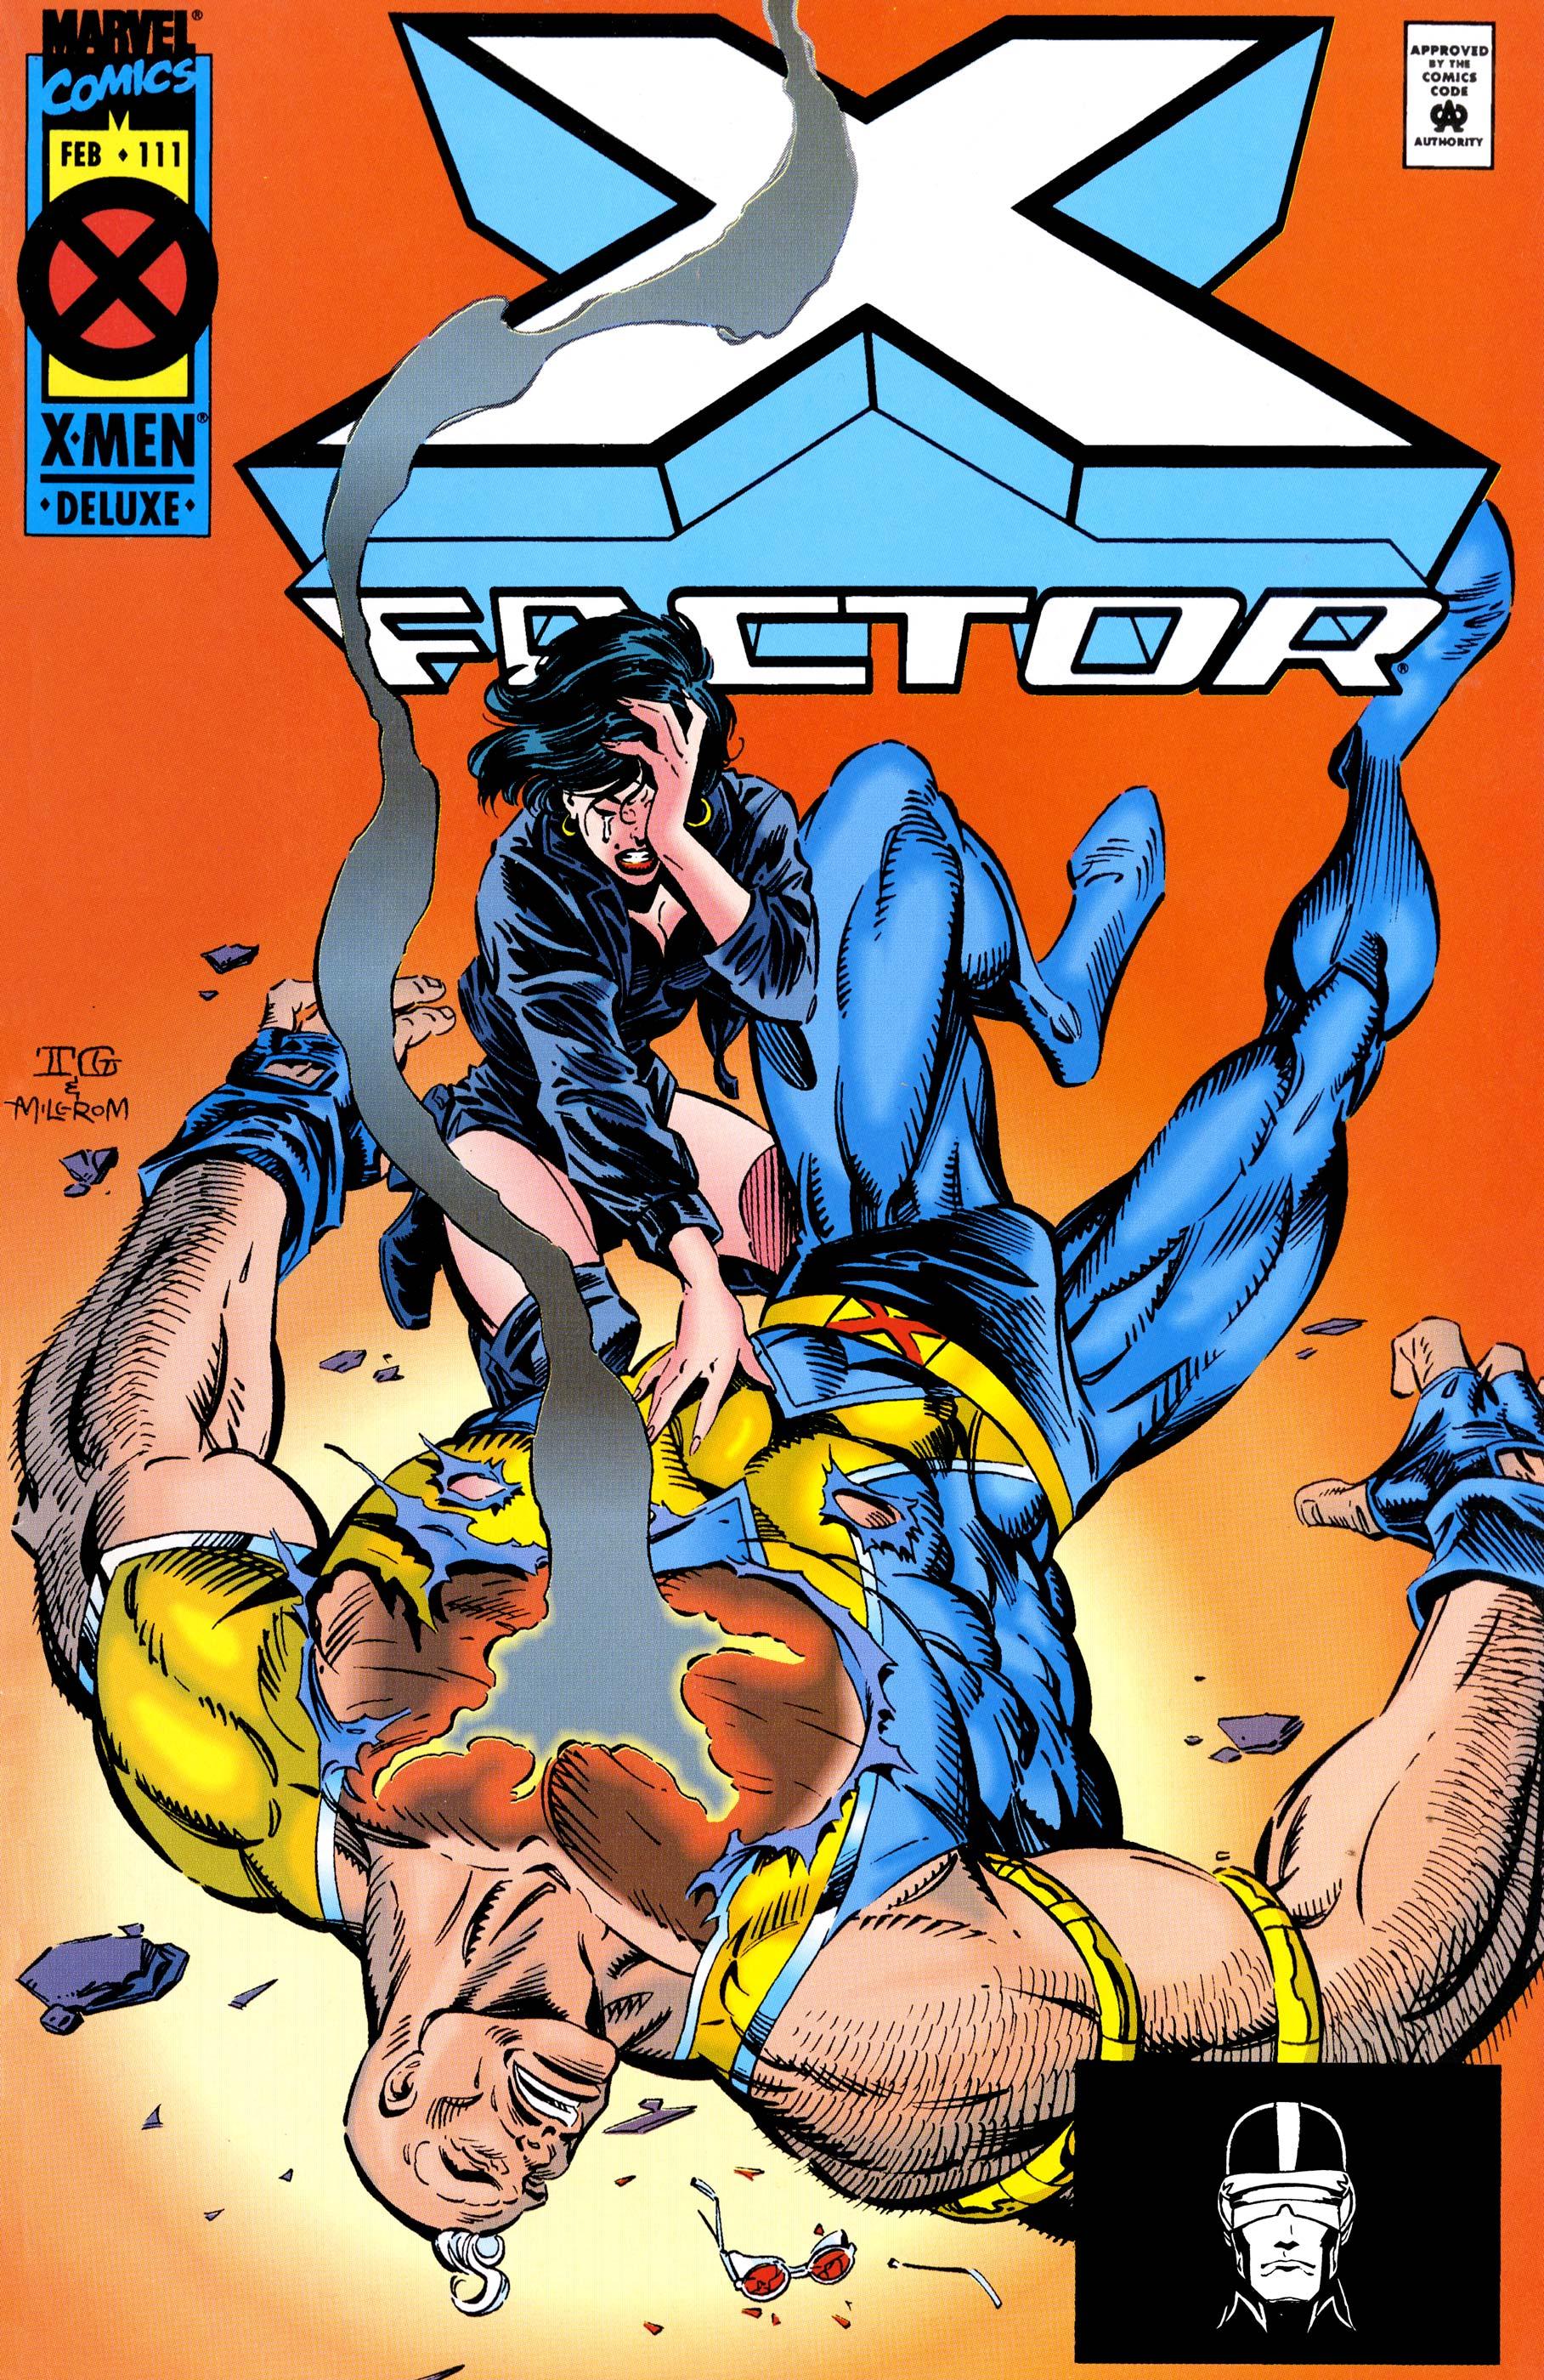 X-Factor (1986) #111